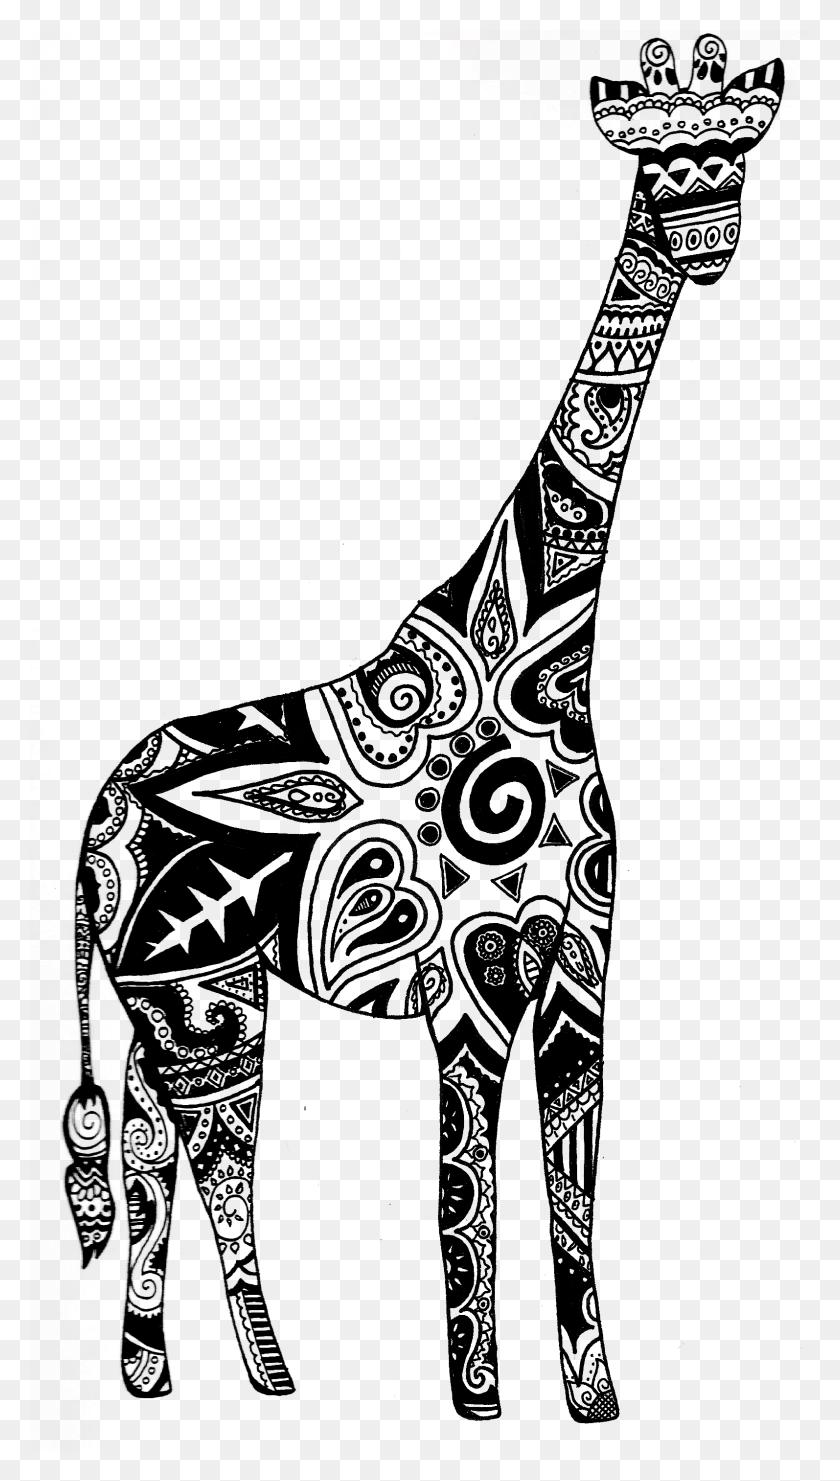 Doodling Giraffes Giraffes Giraffe, Giraffe Tattoos, Henna - Henna PNG